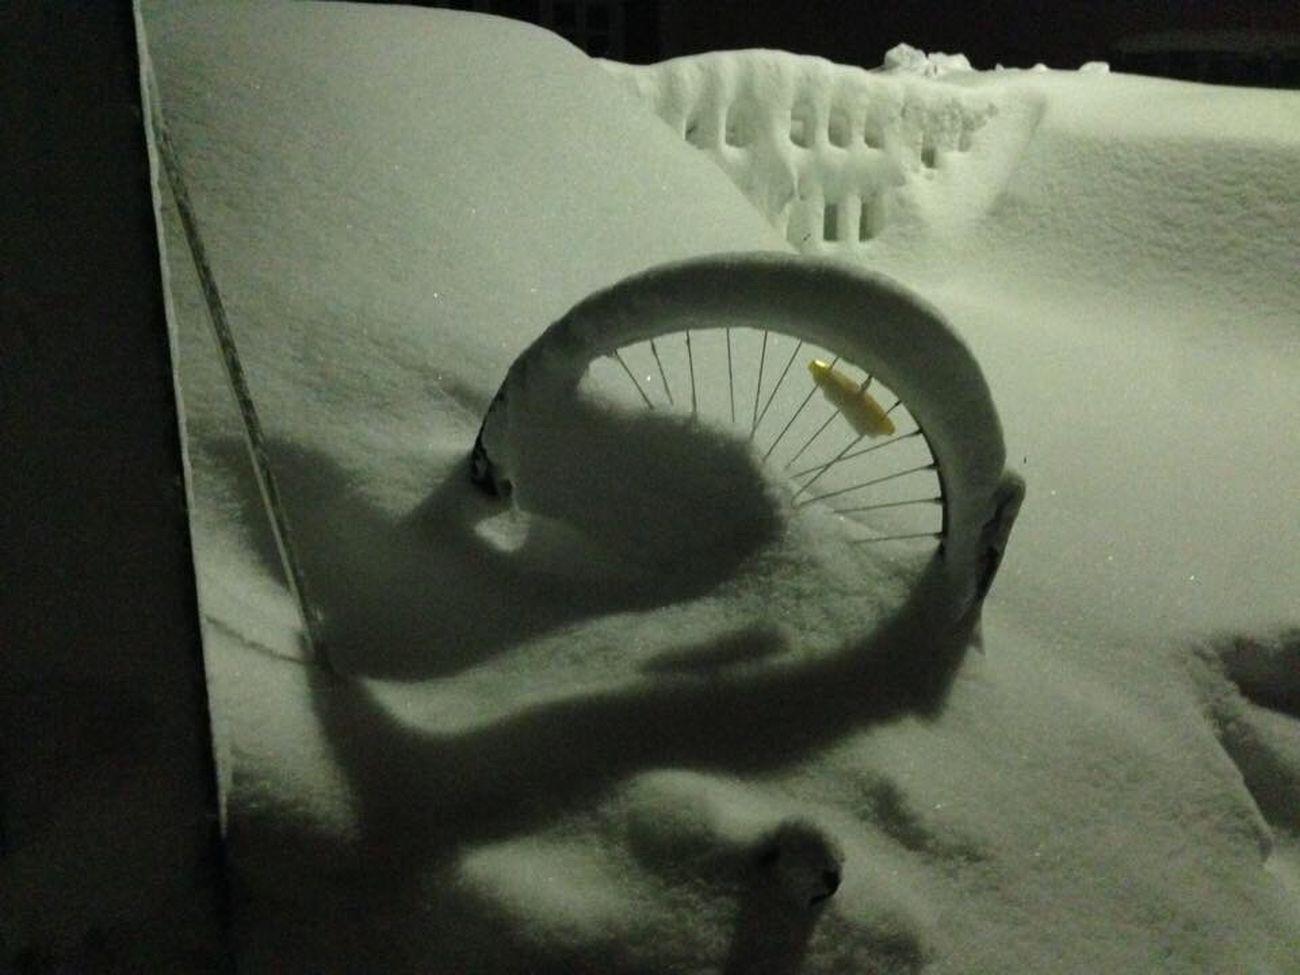 Bike Bikelife BikeNight Bikeswithoutlimits Bike In Nature Bike In The Storm Bike In The Snow Cold Winter ❄⛄ Snowcapped This Week On Eye Em